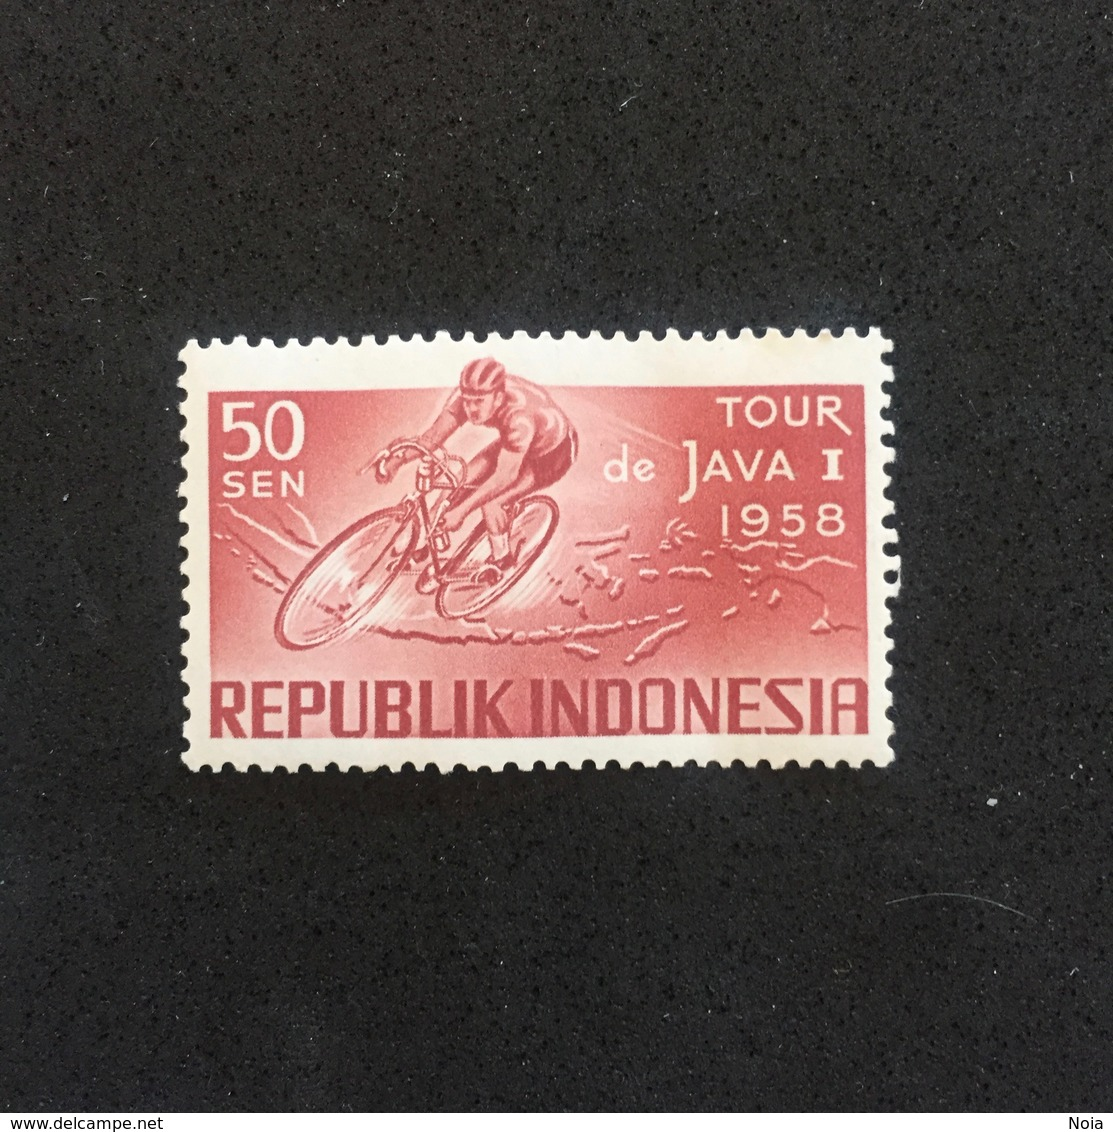 INDONESIA. JAVA TOUR 1958. MNH. C3705A - Cycling